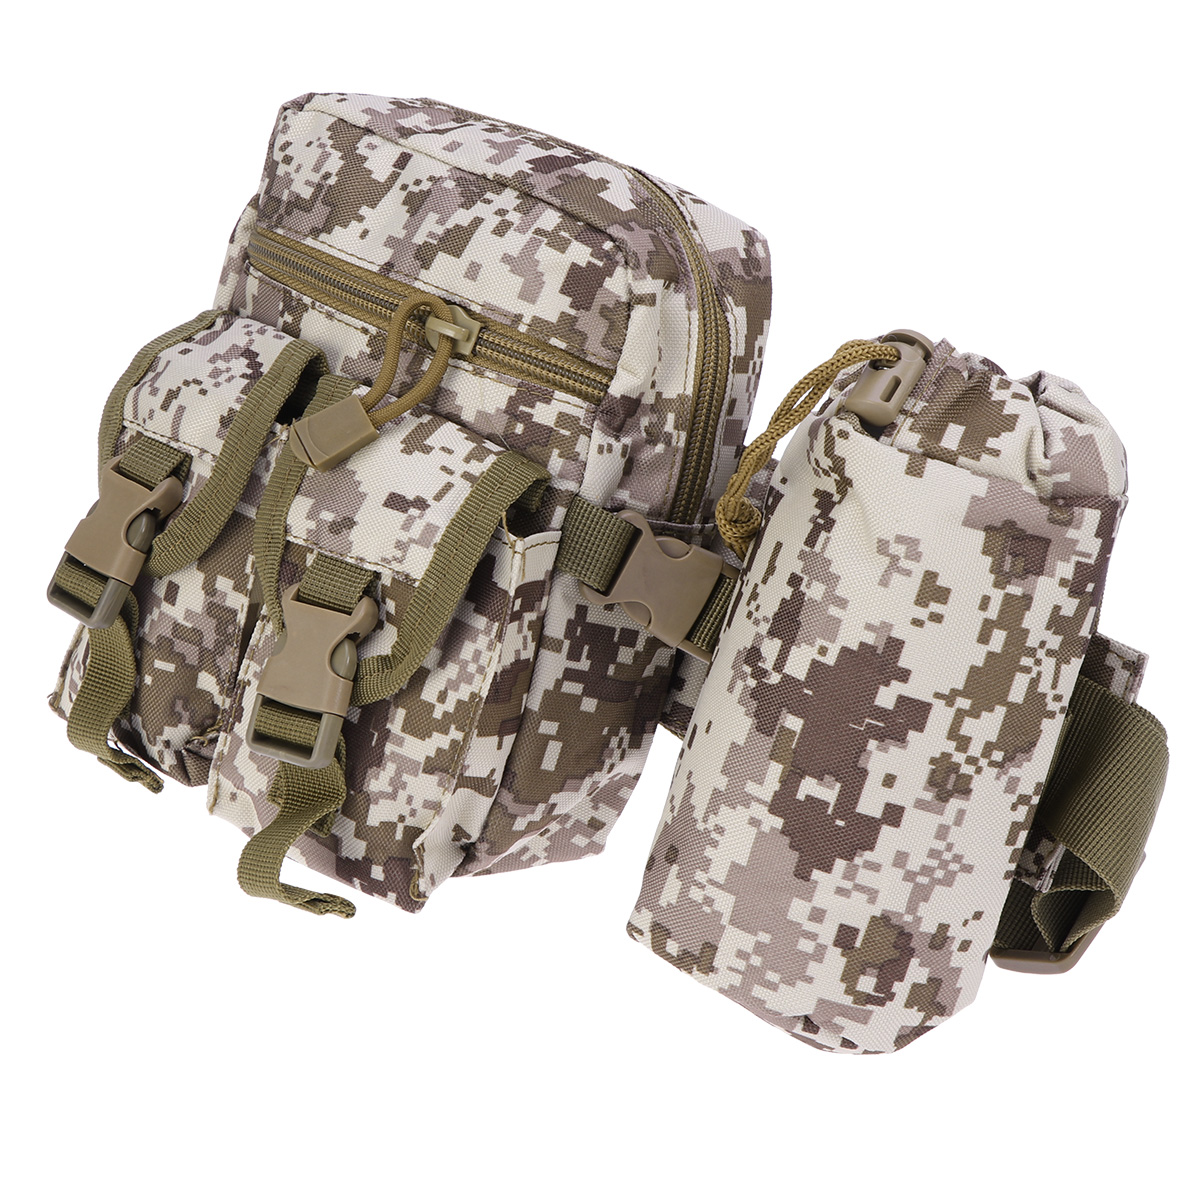 Waist Pack Premium Adjustable Durable Water Bottle Belt Fanny Pack Waist Bag With Bottle Holder For Sports Climbing Outdoor